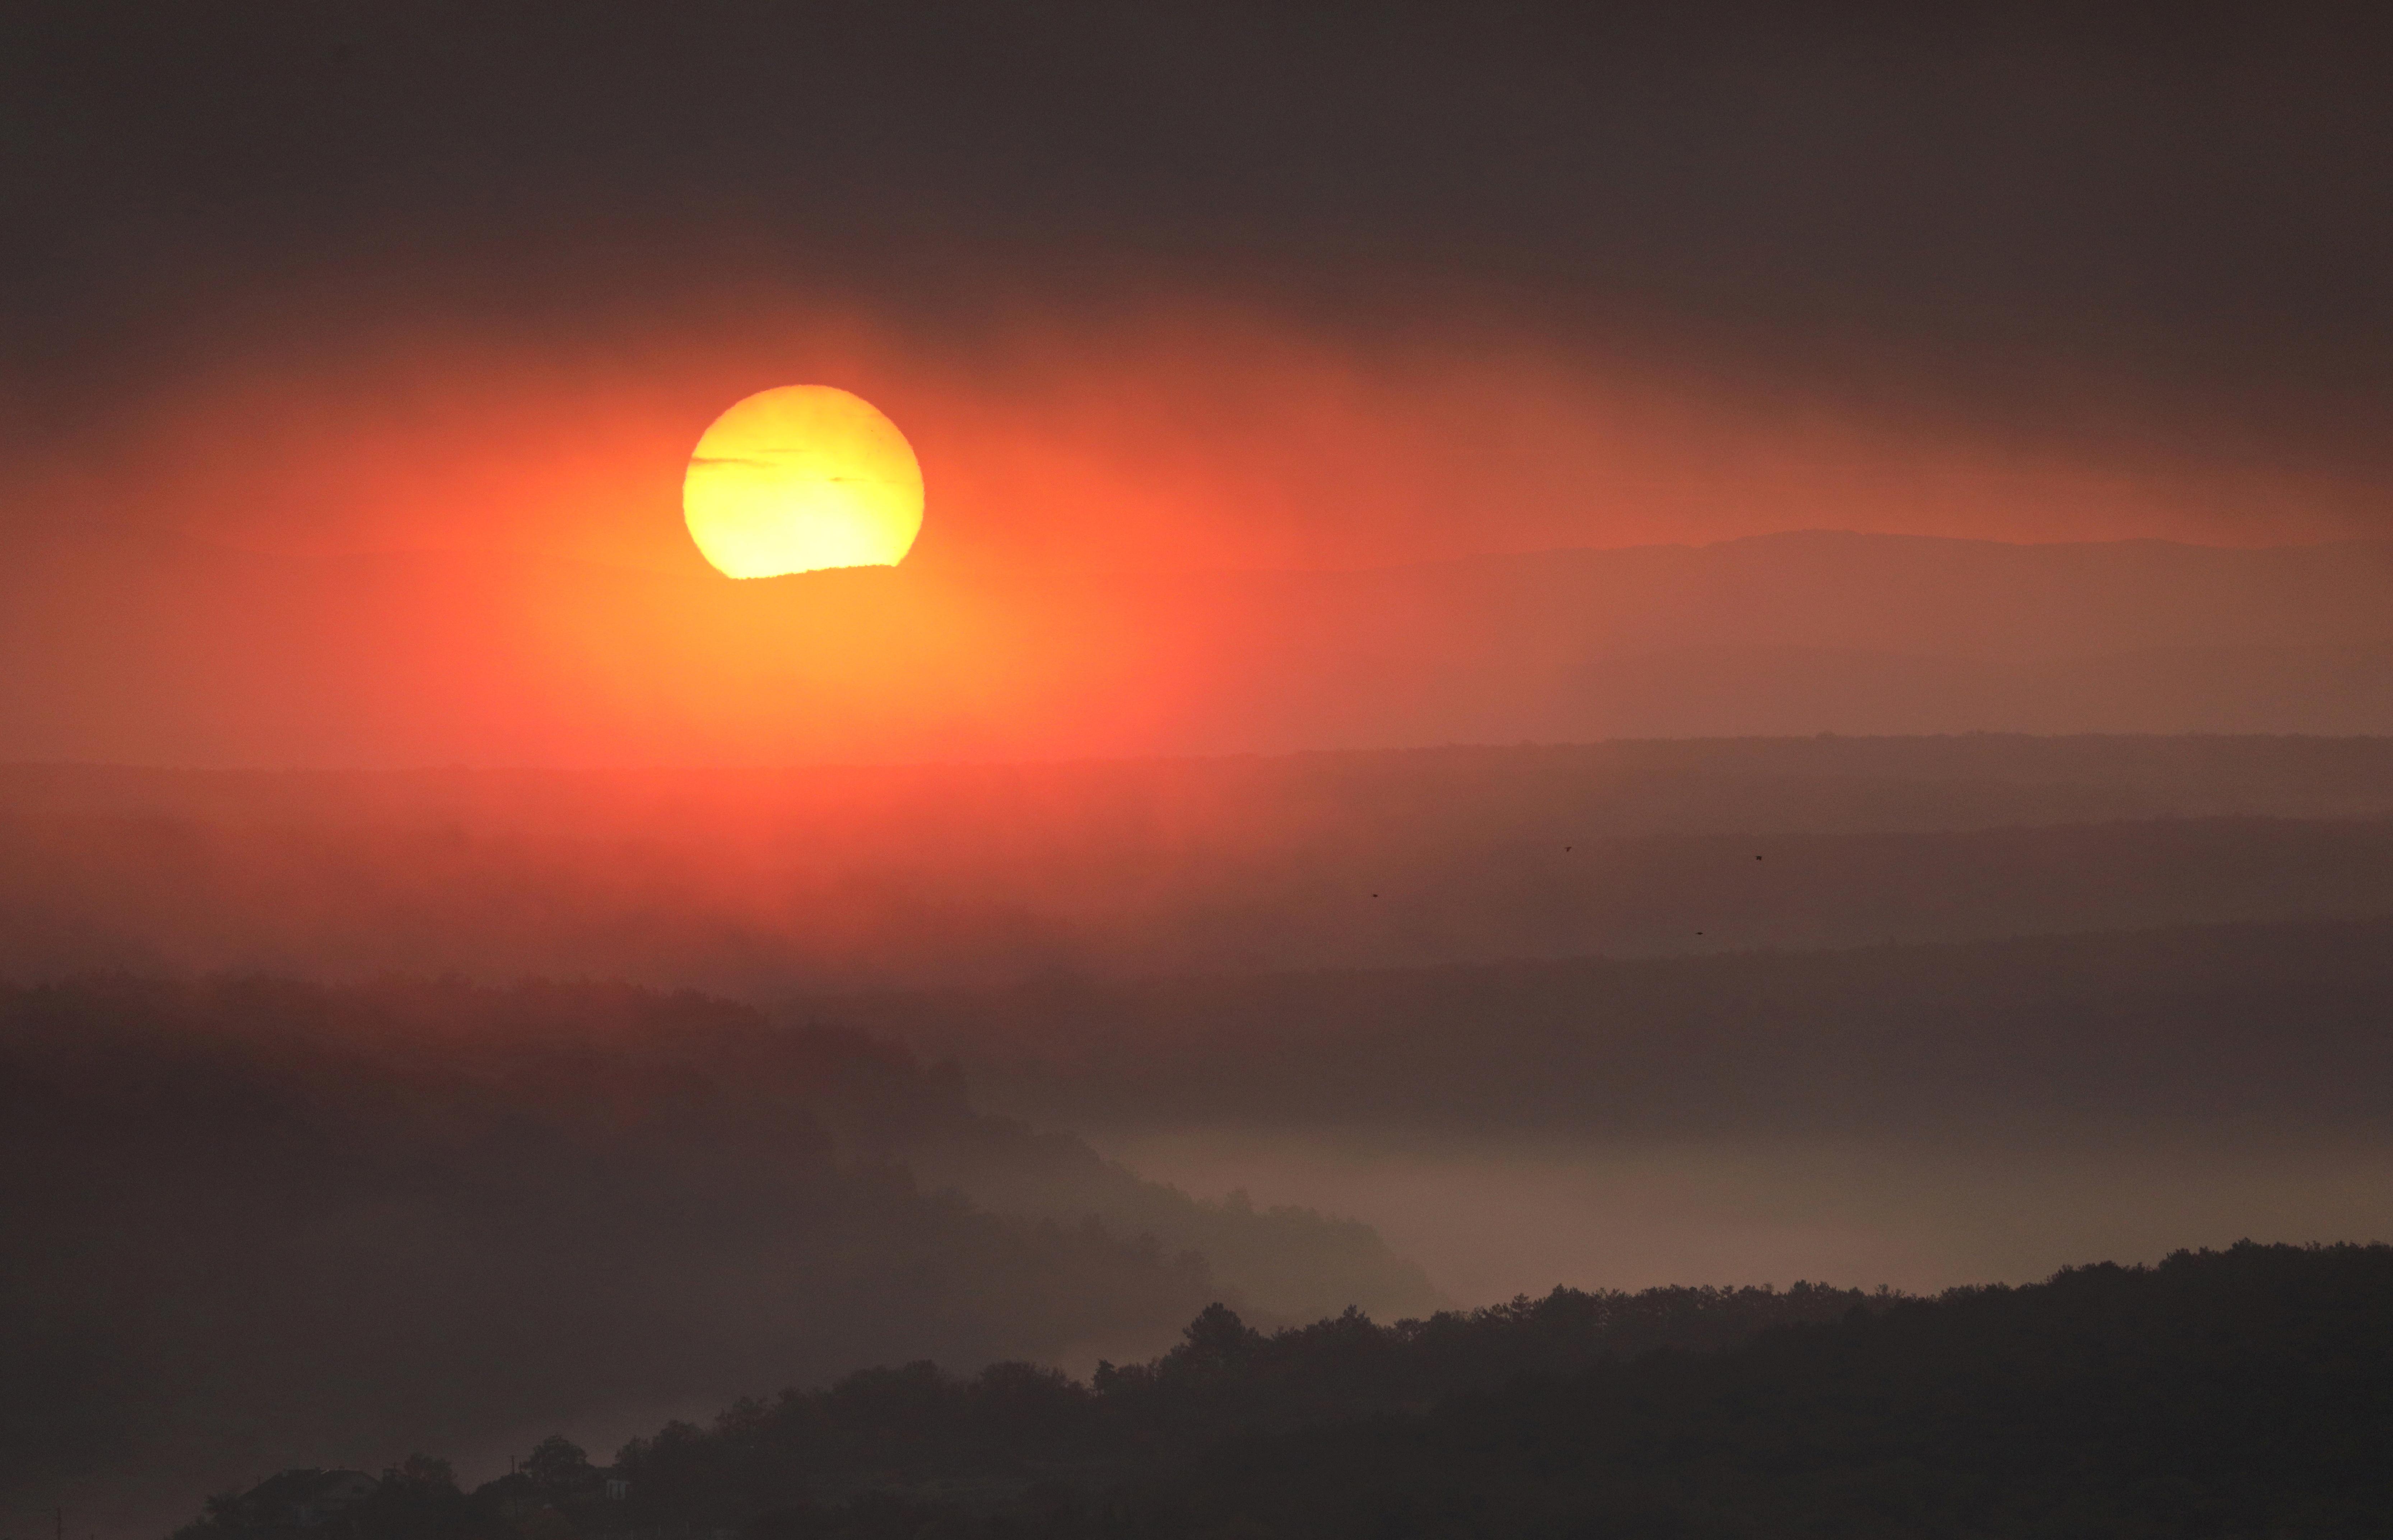 The rising sun is pictured outside Sevastopol, Crimea October 29, 2020. REUTERS/Alexey Pavlishak/File Photo